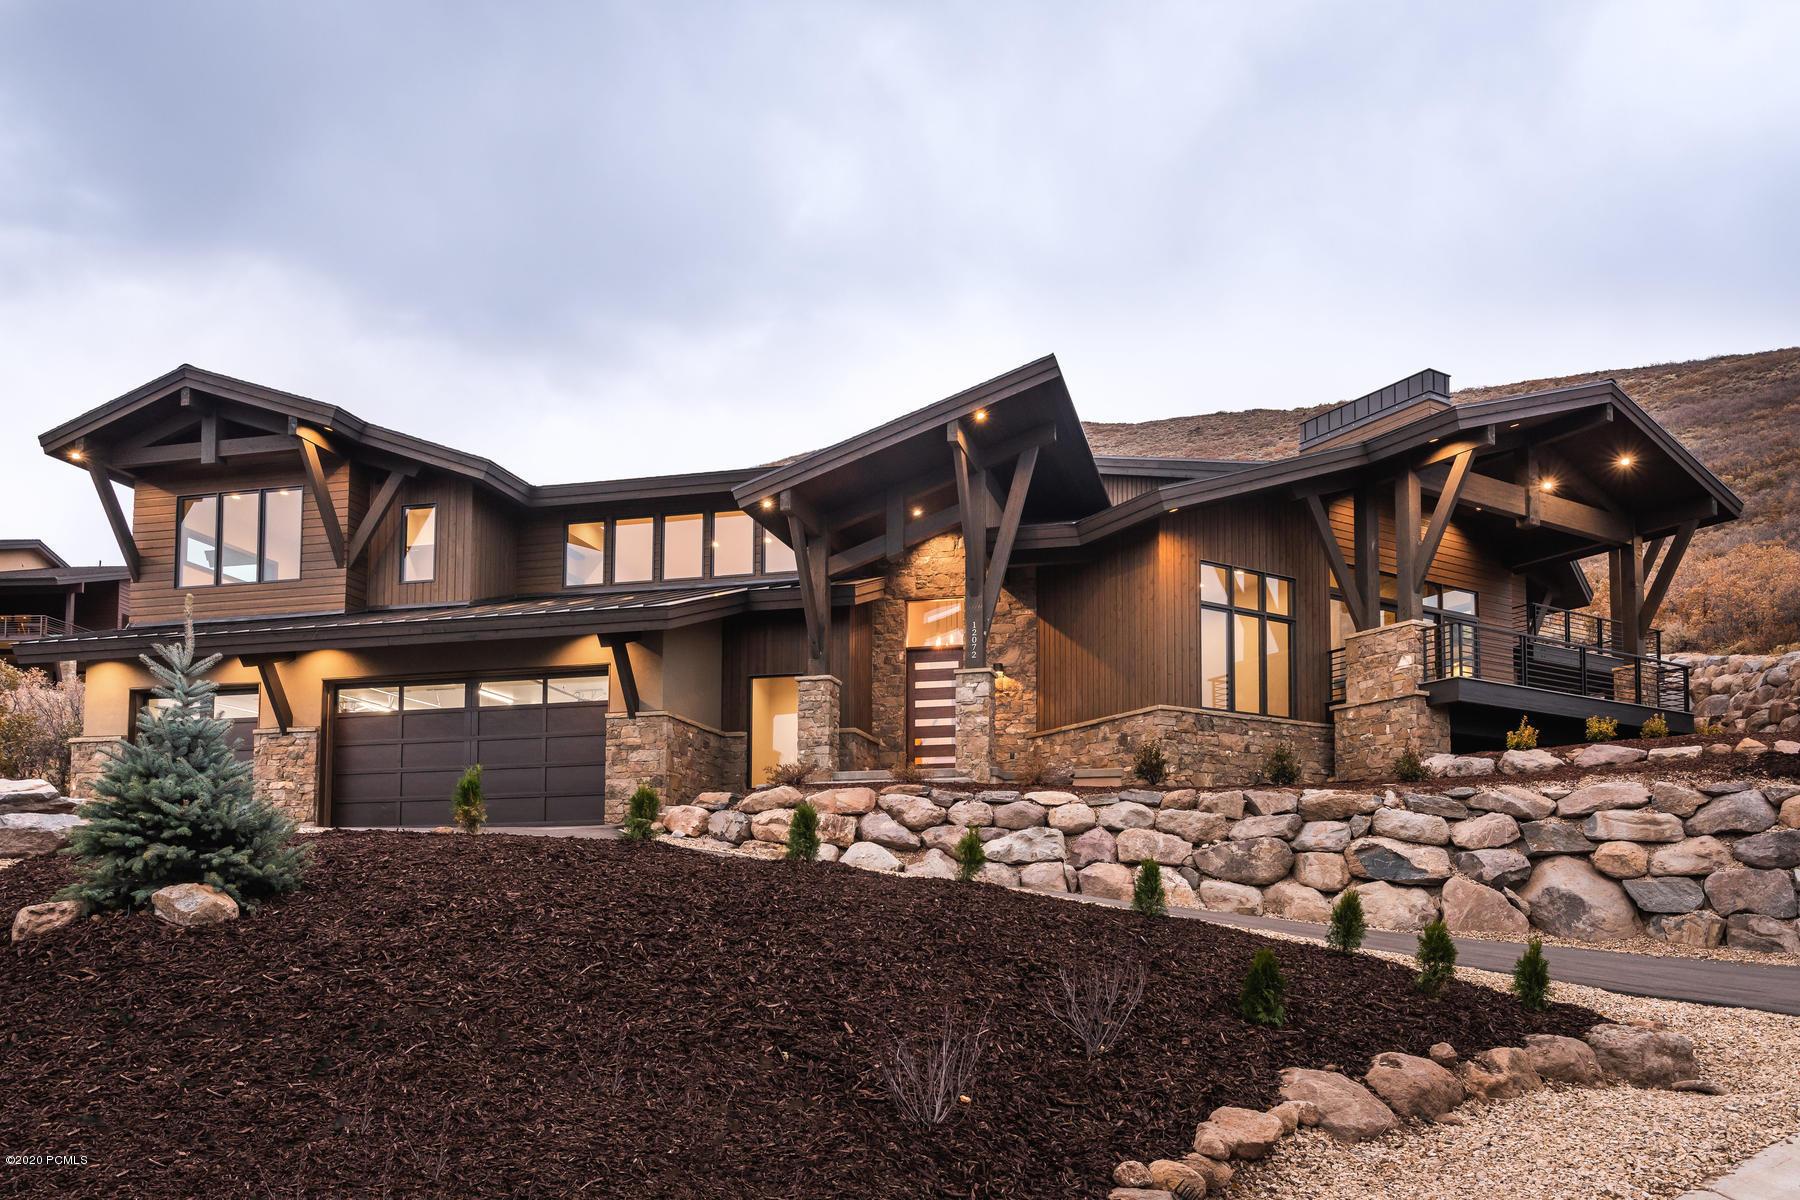 12072 Sage Hollow Circle, Kamas, Utah 84036, 4 Bedrooms Bedrooms, ,5 BathroomsBathrooms,Single Family,For Sale,Sage Hollow,11908196